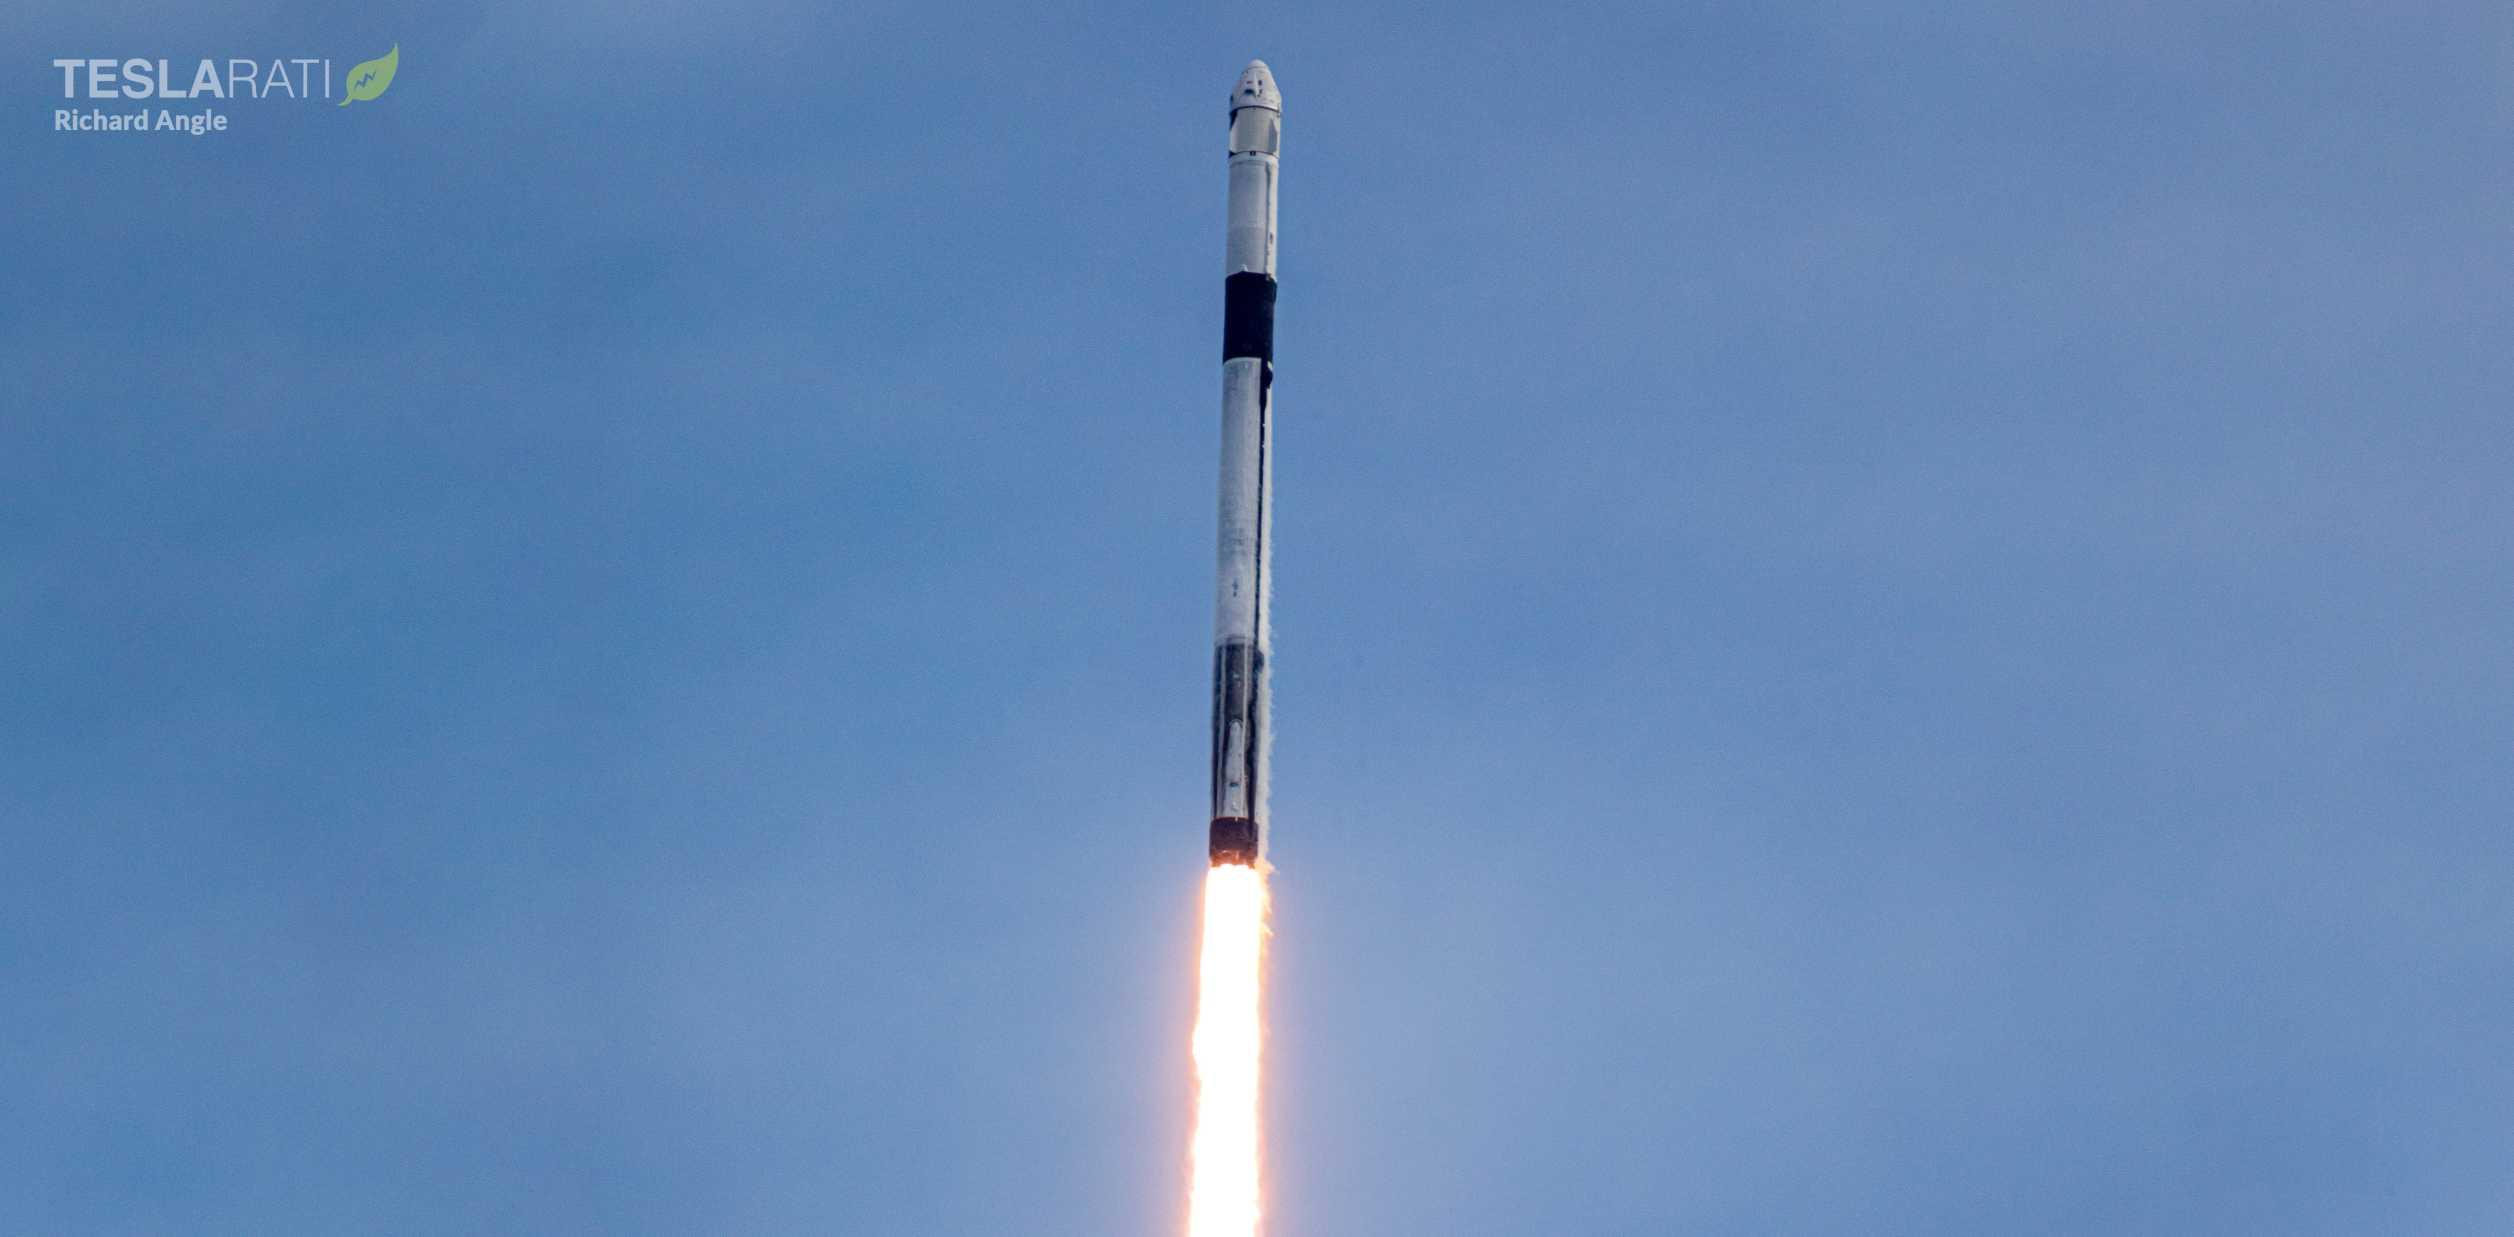 Crew Dragon C205 F9 B1046 IFA 39A launch 011920 (Richard Angle) (3) crop (c)